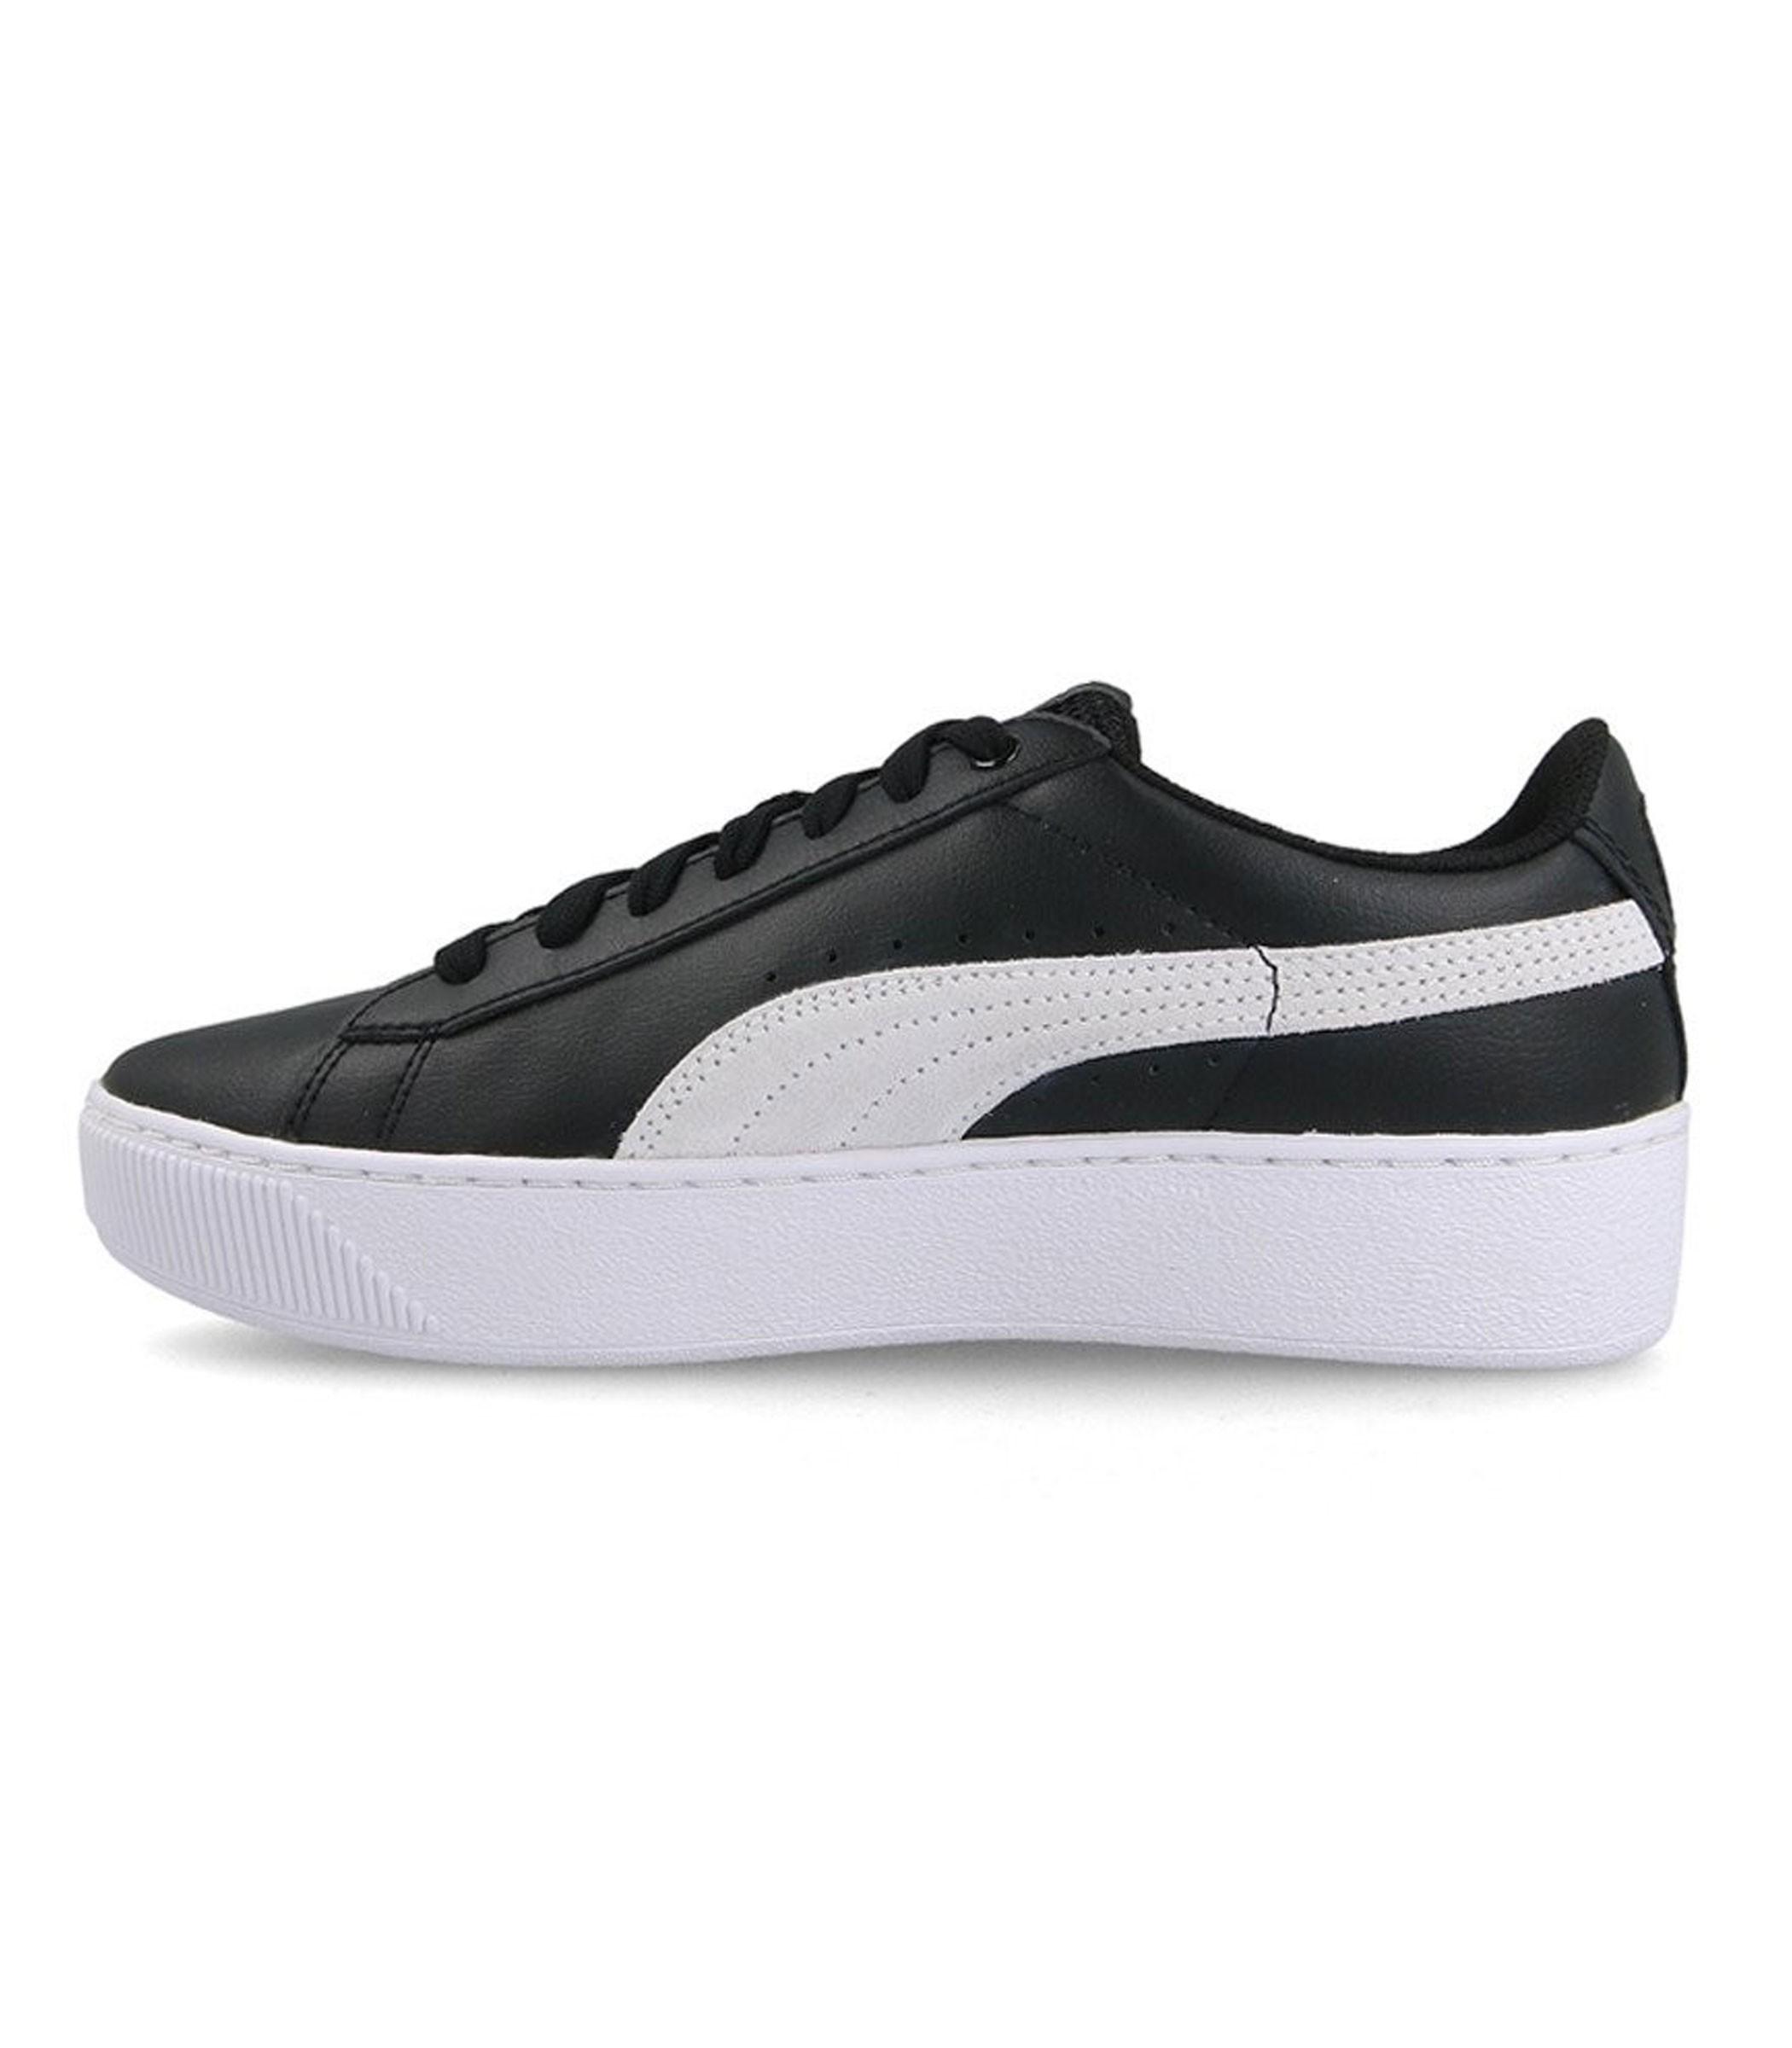 5186d11a08db93 Scarpe Sneakers Puma Vikky Platform L da donna rif. 364893 01